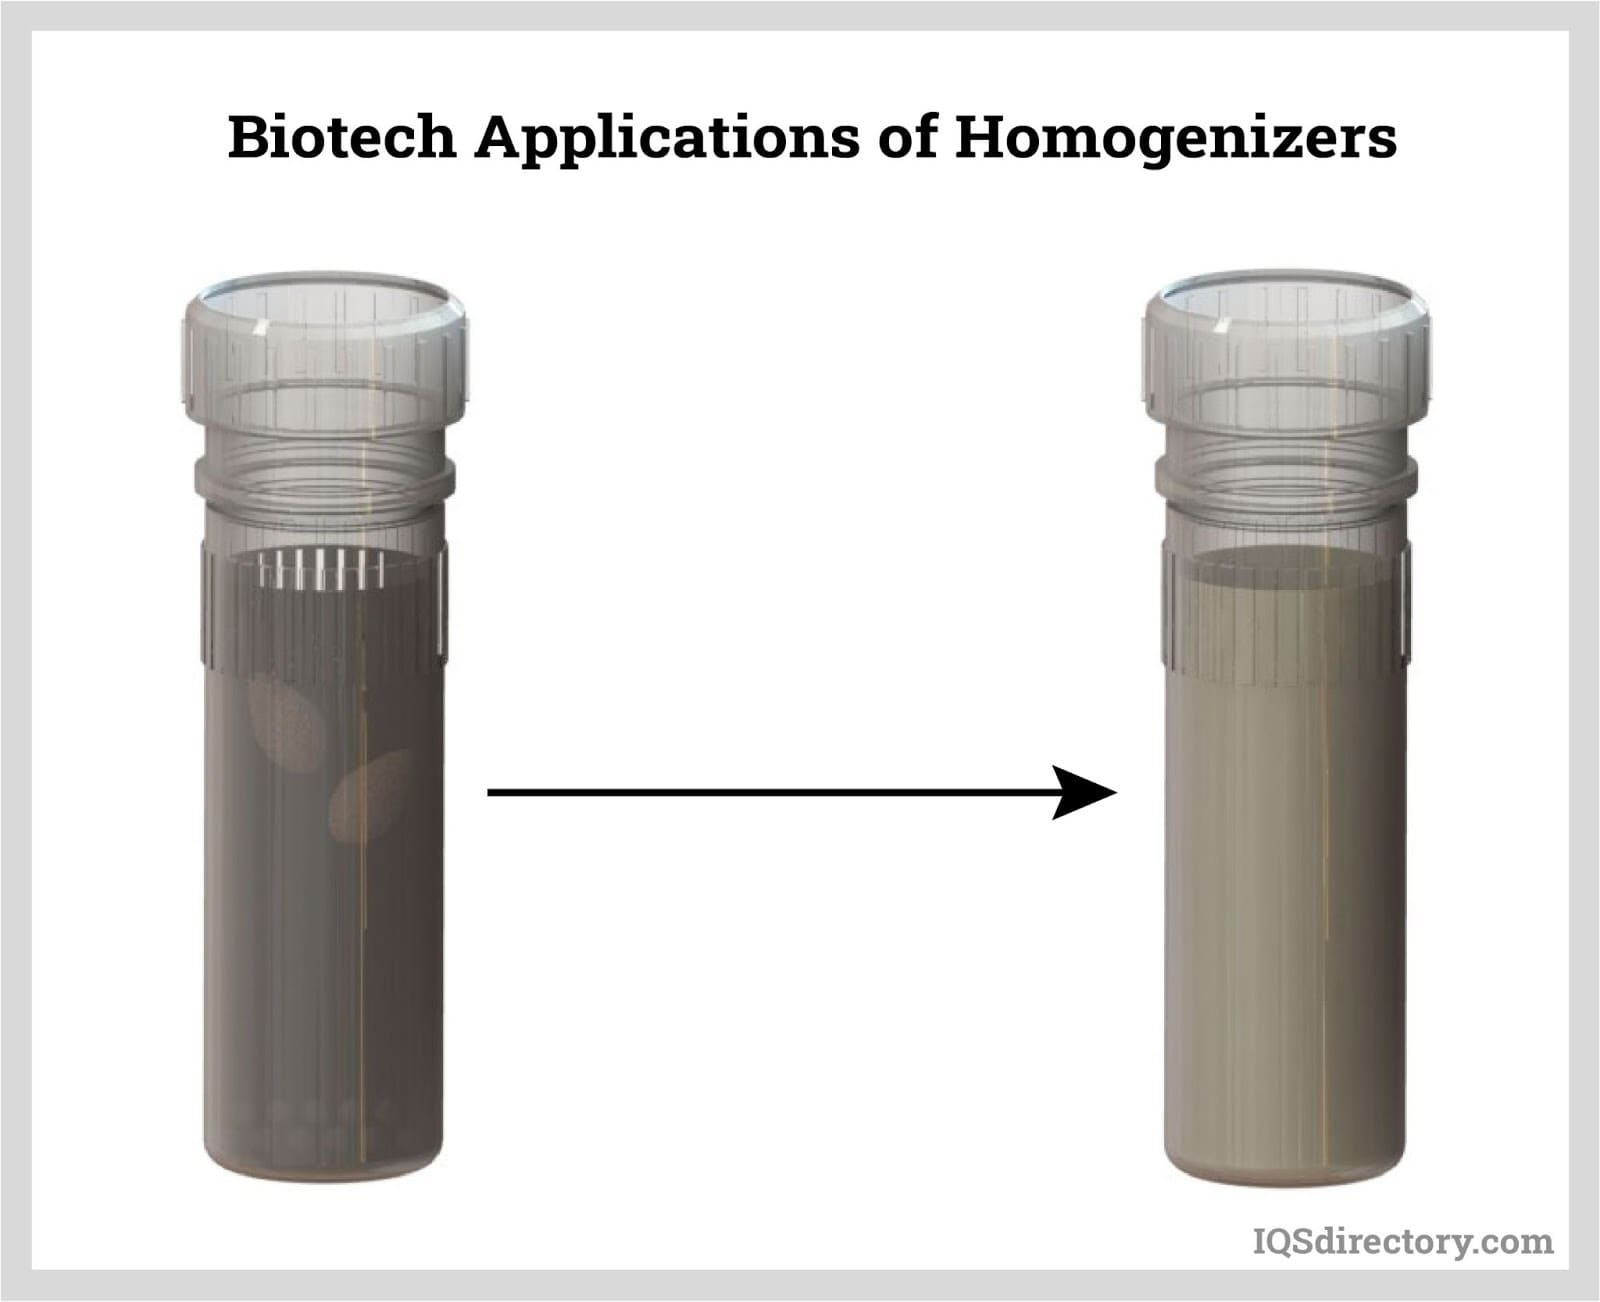 Biotech Applications of Homogenizers